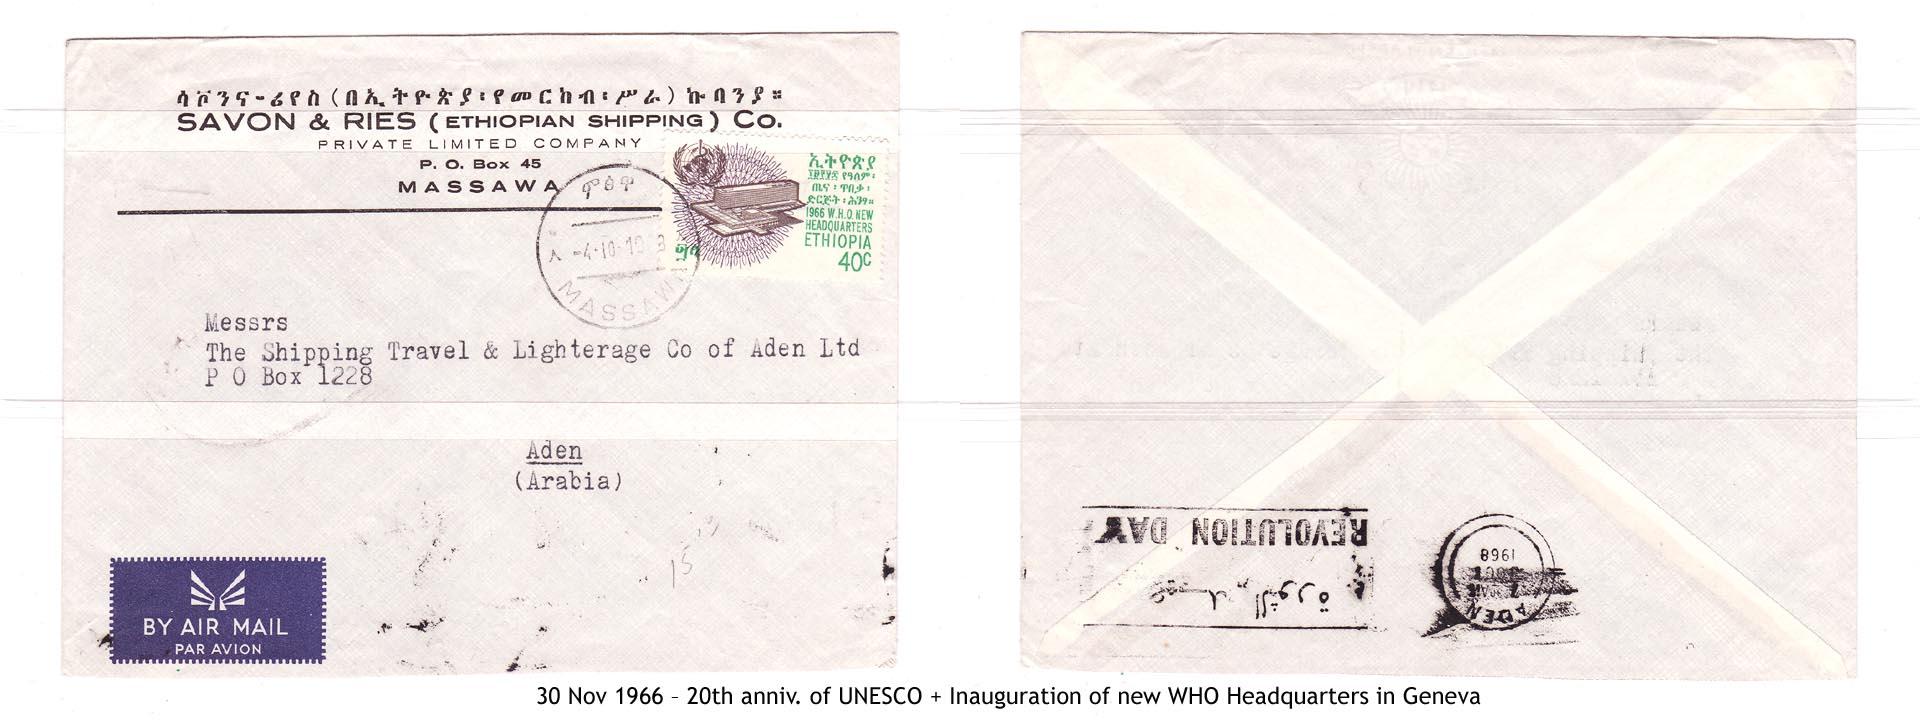 19661130 – 20th anniv. of UNESCO + Inauguration of new WHO Headquarters in Geneva